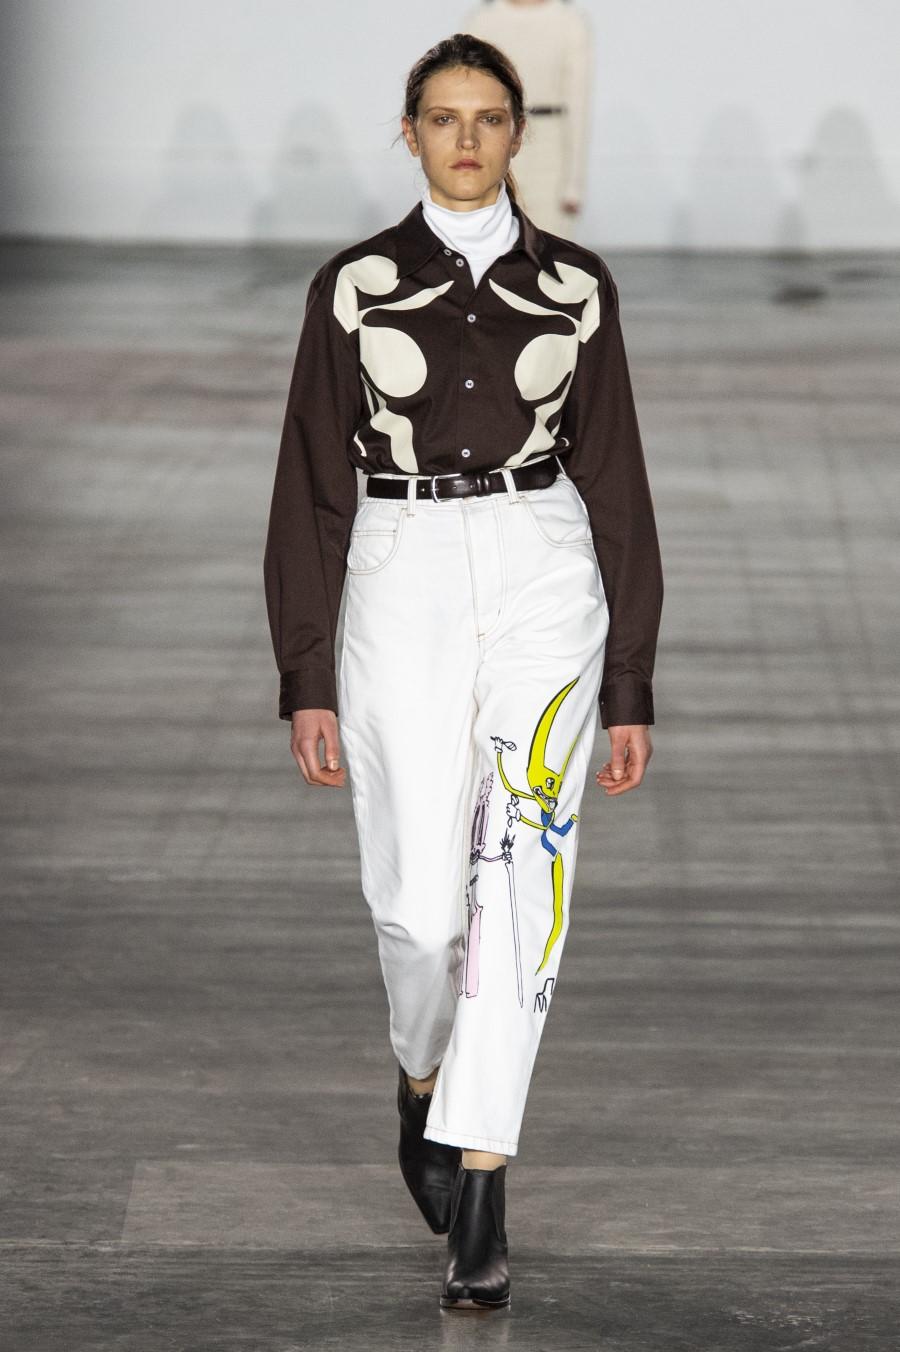 Alex Mullins Automne-Hiver 2019-2020 - London Fashion Week Men's